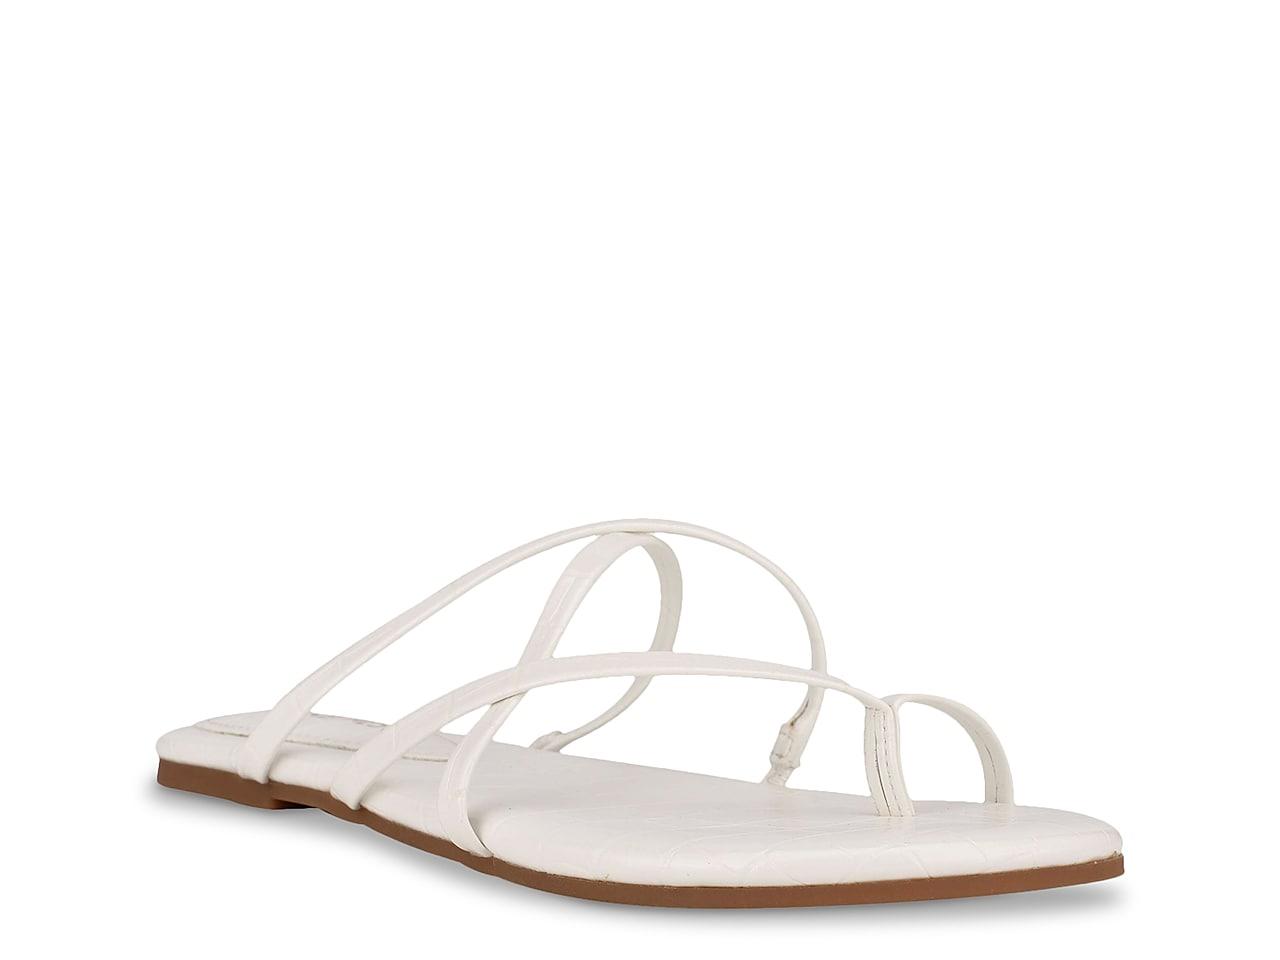 Nine West Brice 3 Sandal